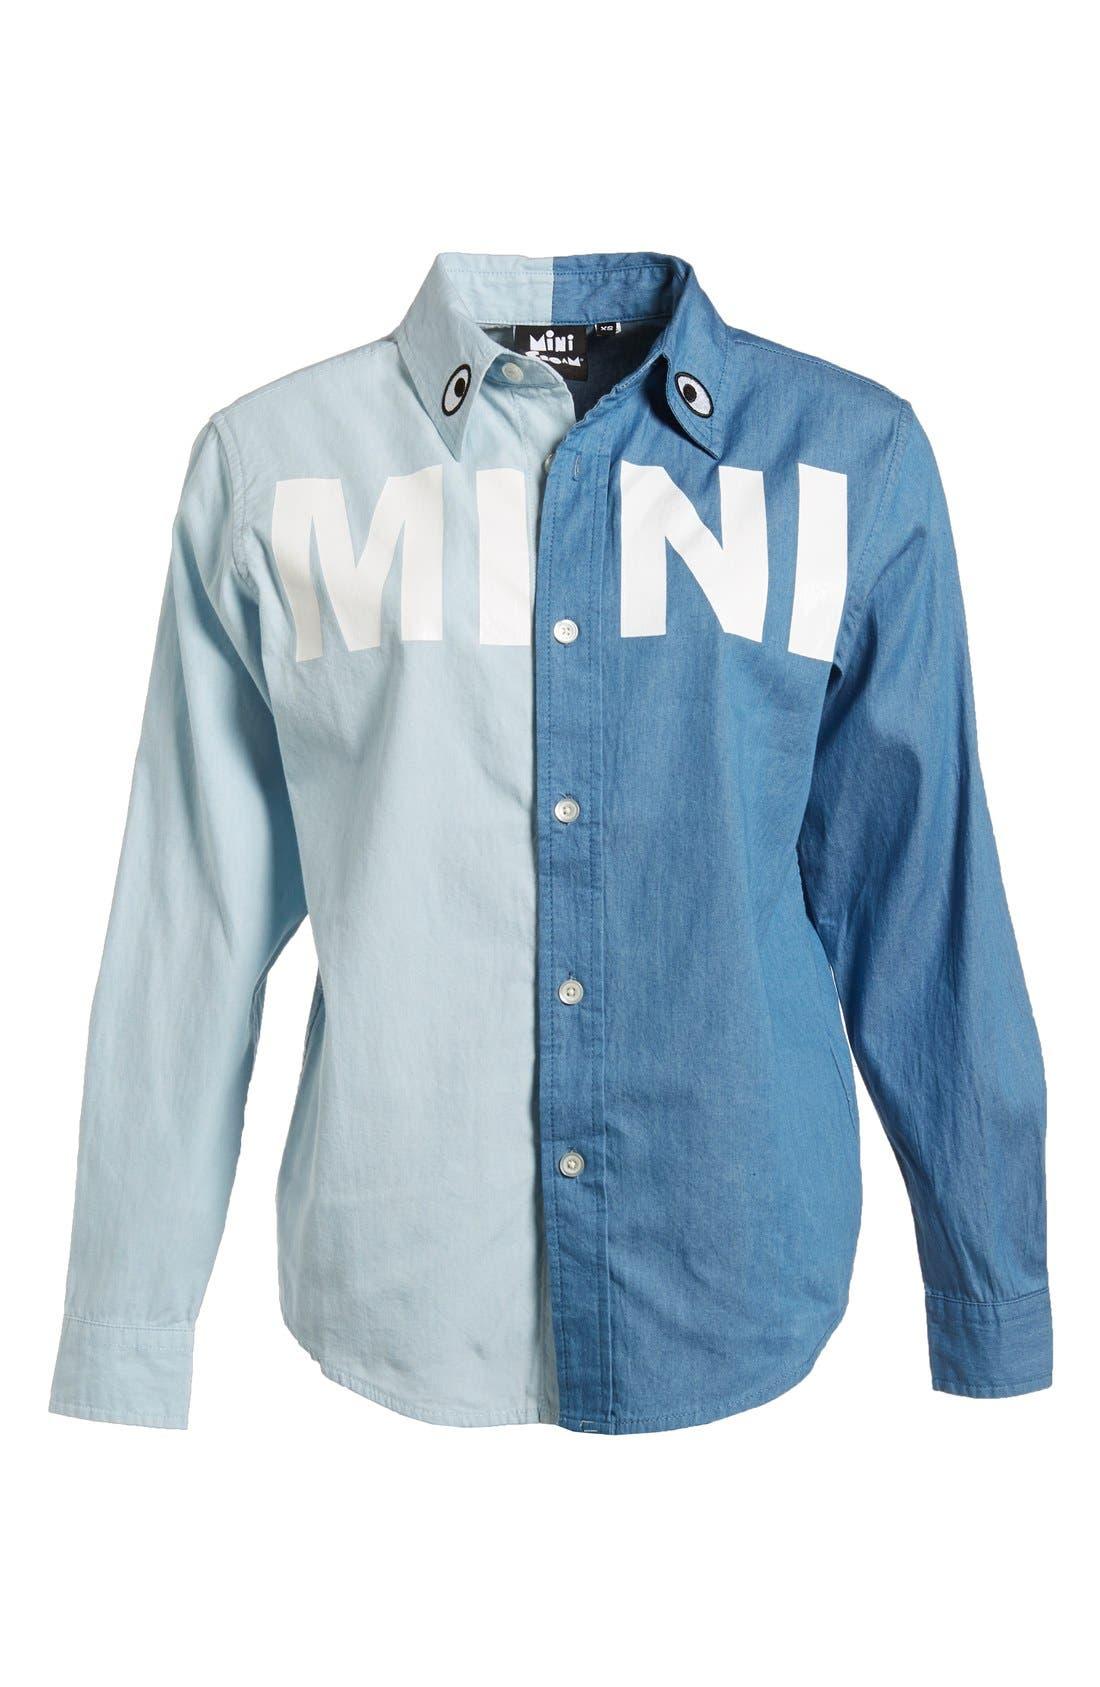 Main Image - Mini Cream 'Mini Wish' Two-Tone Chambray Shirt (Women)